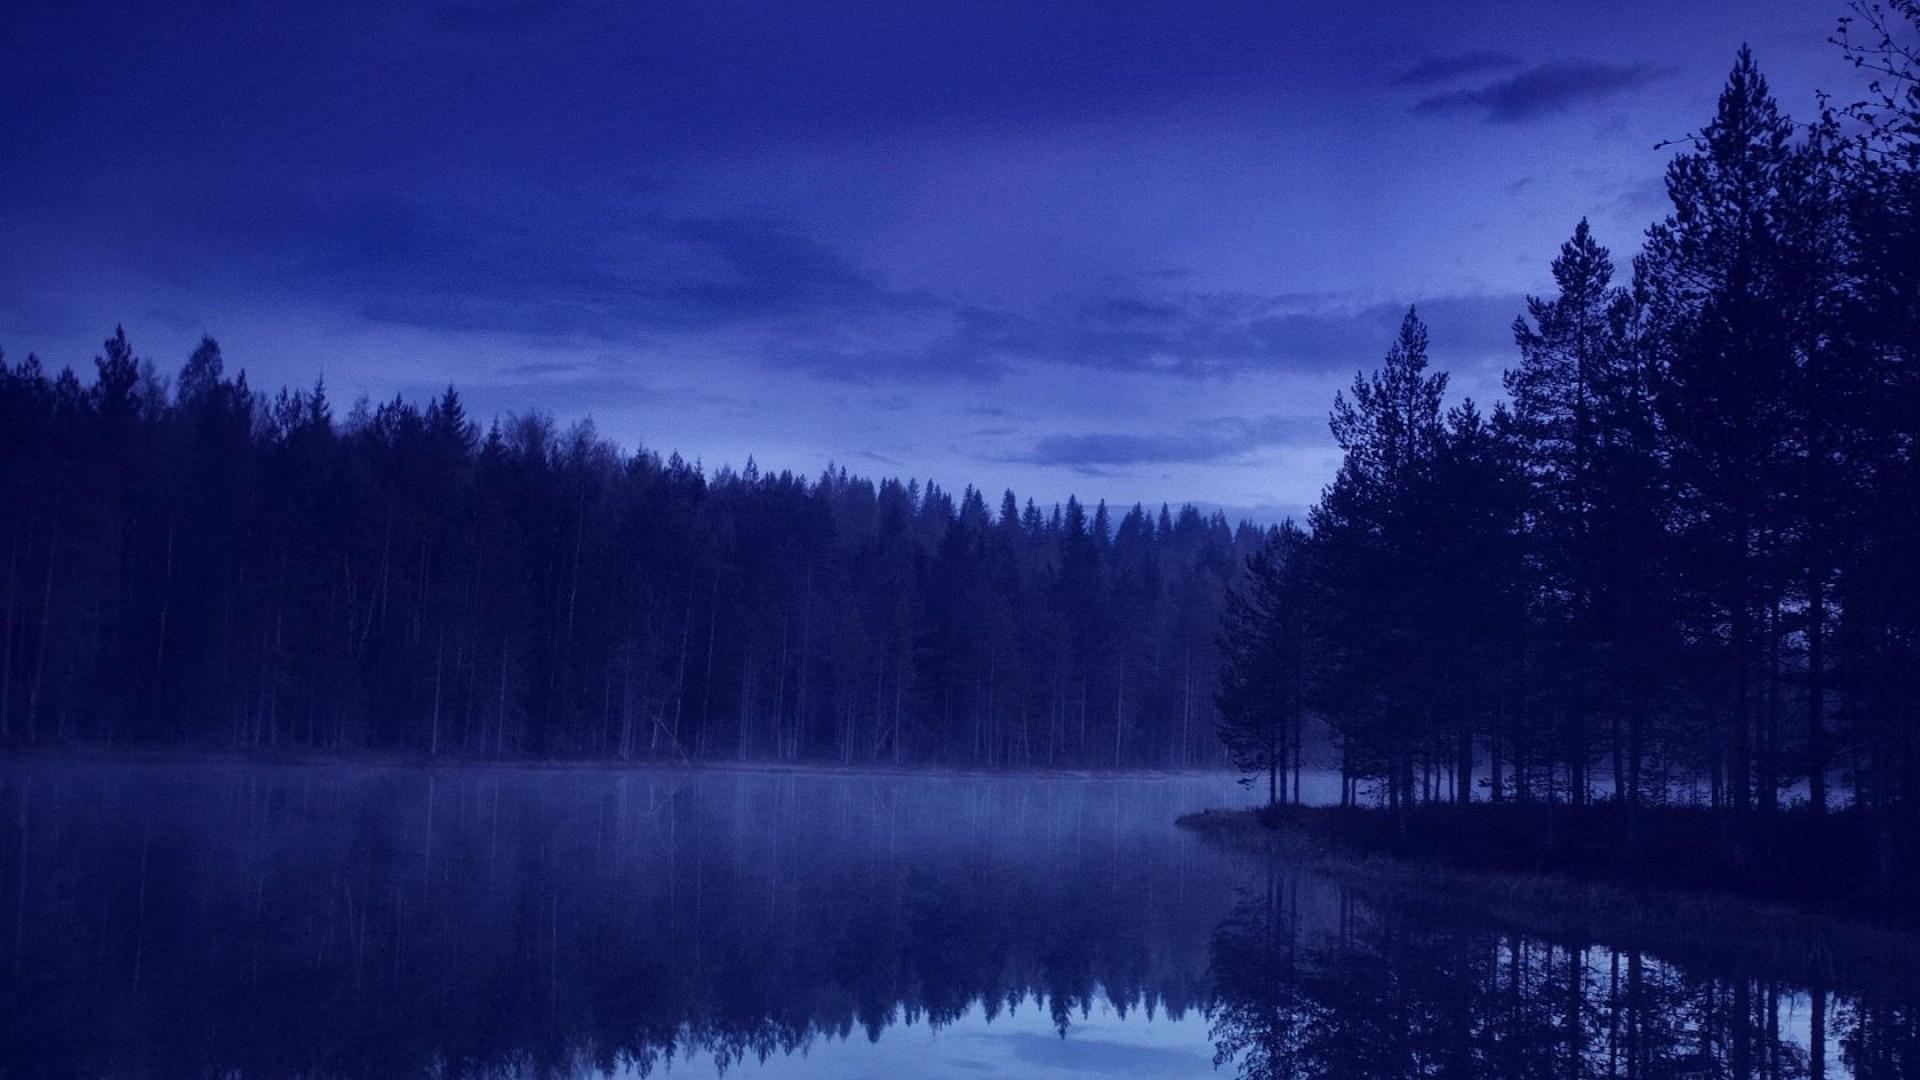 Wallpaper water, forest, beach, night, reflection